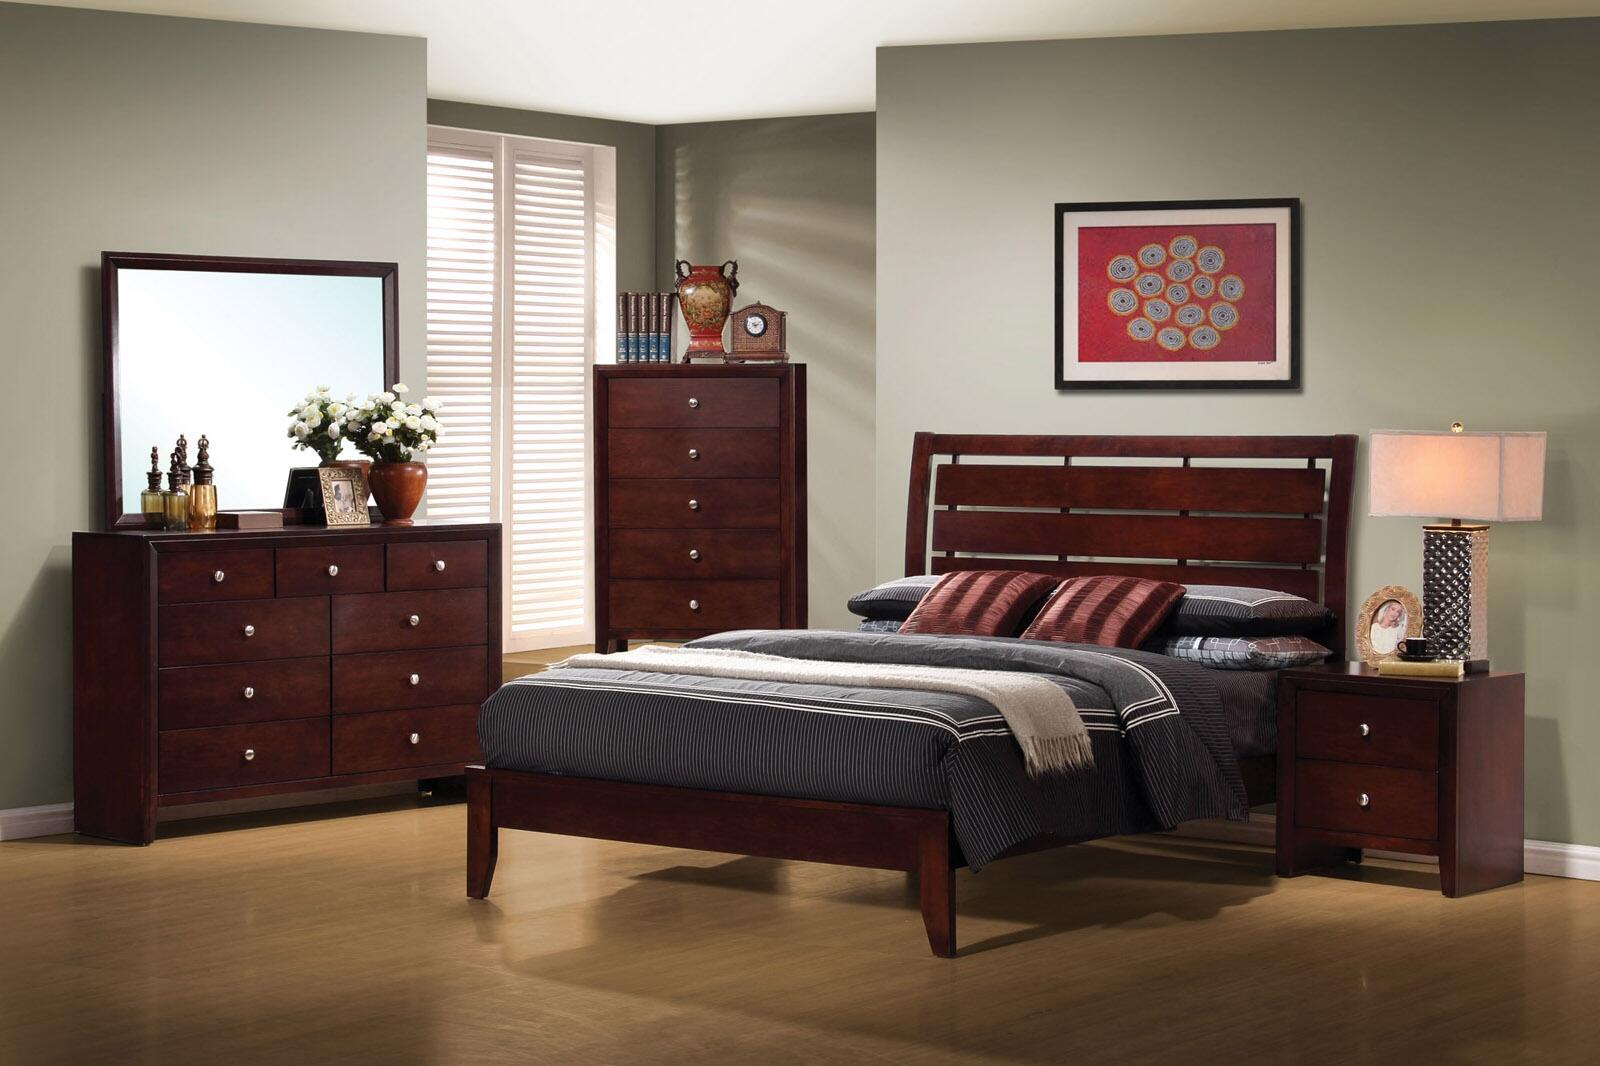 Coaster 201971qset Serenity Queen Bedroom Sets Appliances Connection